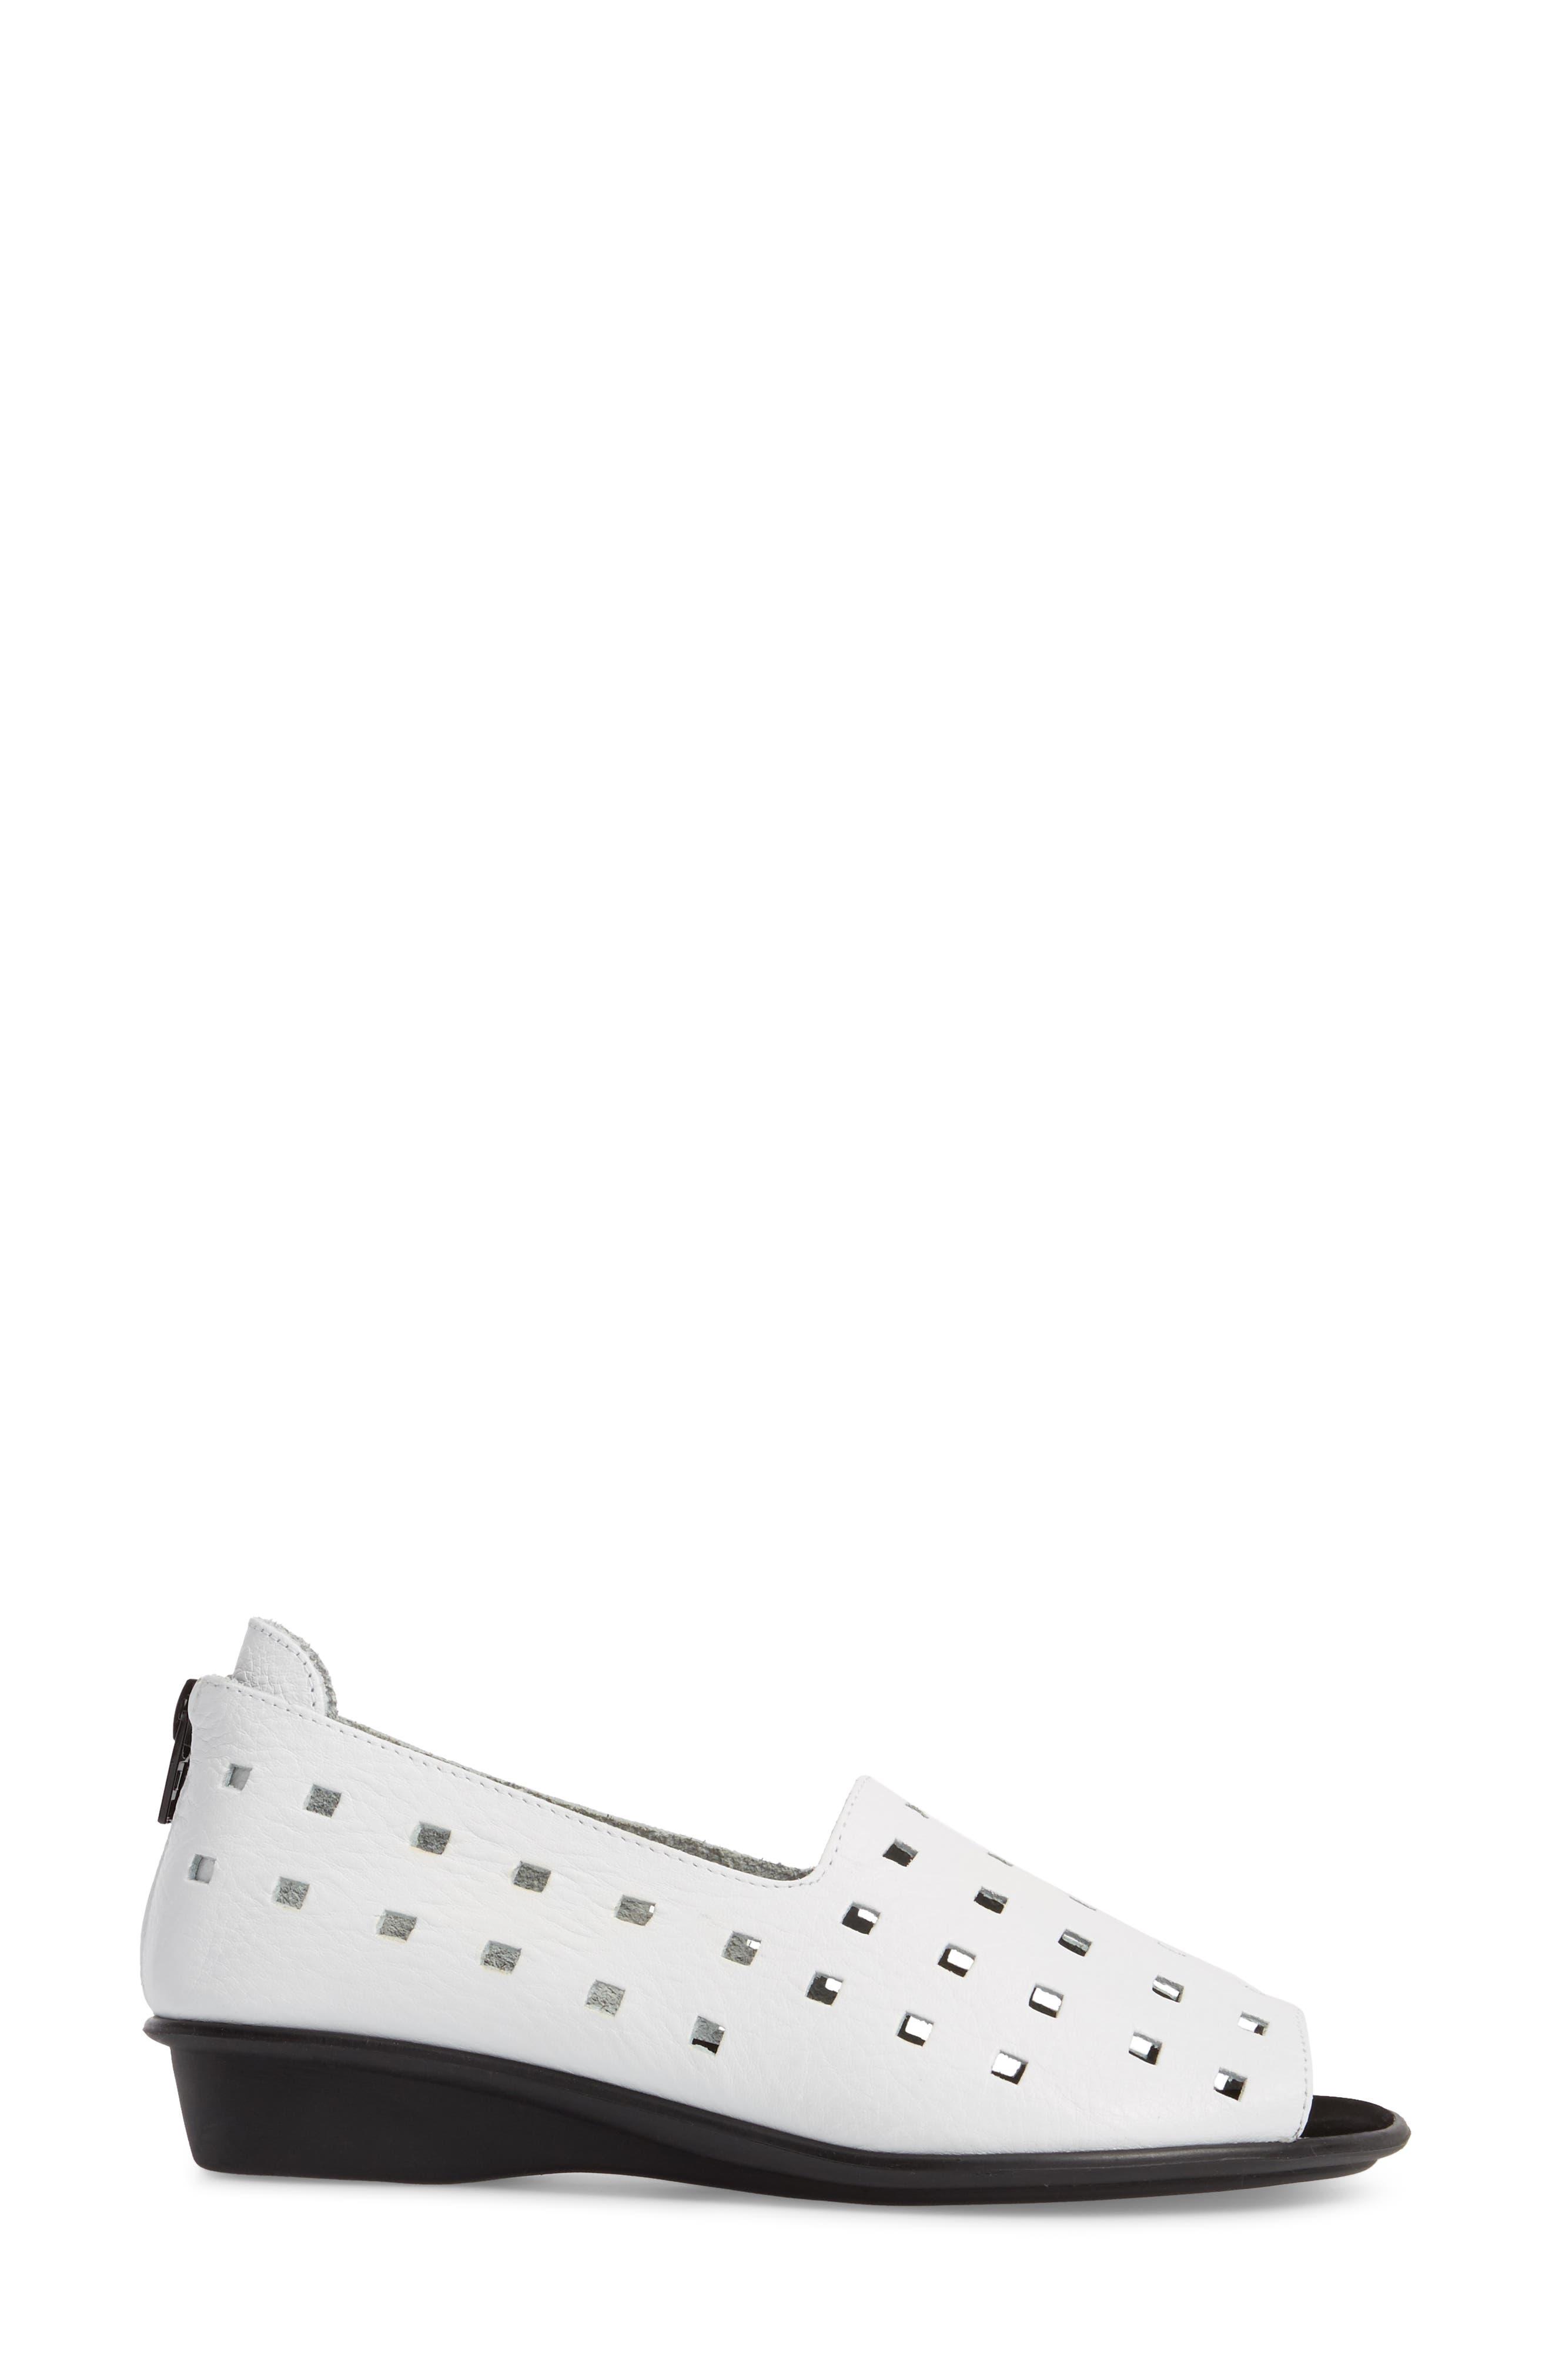 'Evonne' Cutout Open-Toe Flat,                             Alternate thumbnail 3, color,                             WHITE LEATHER